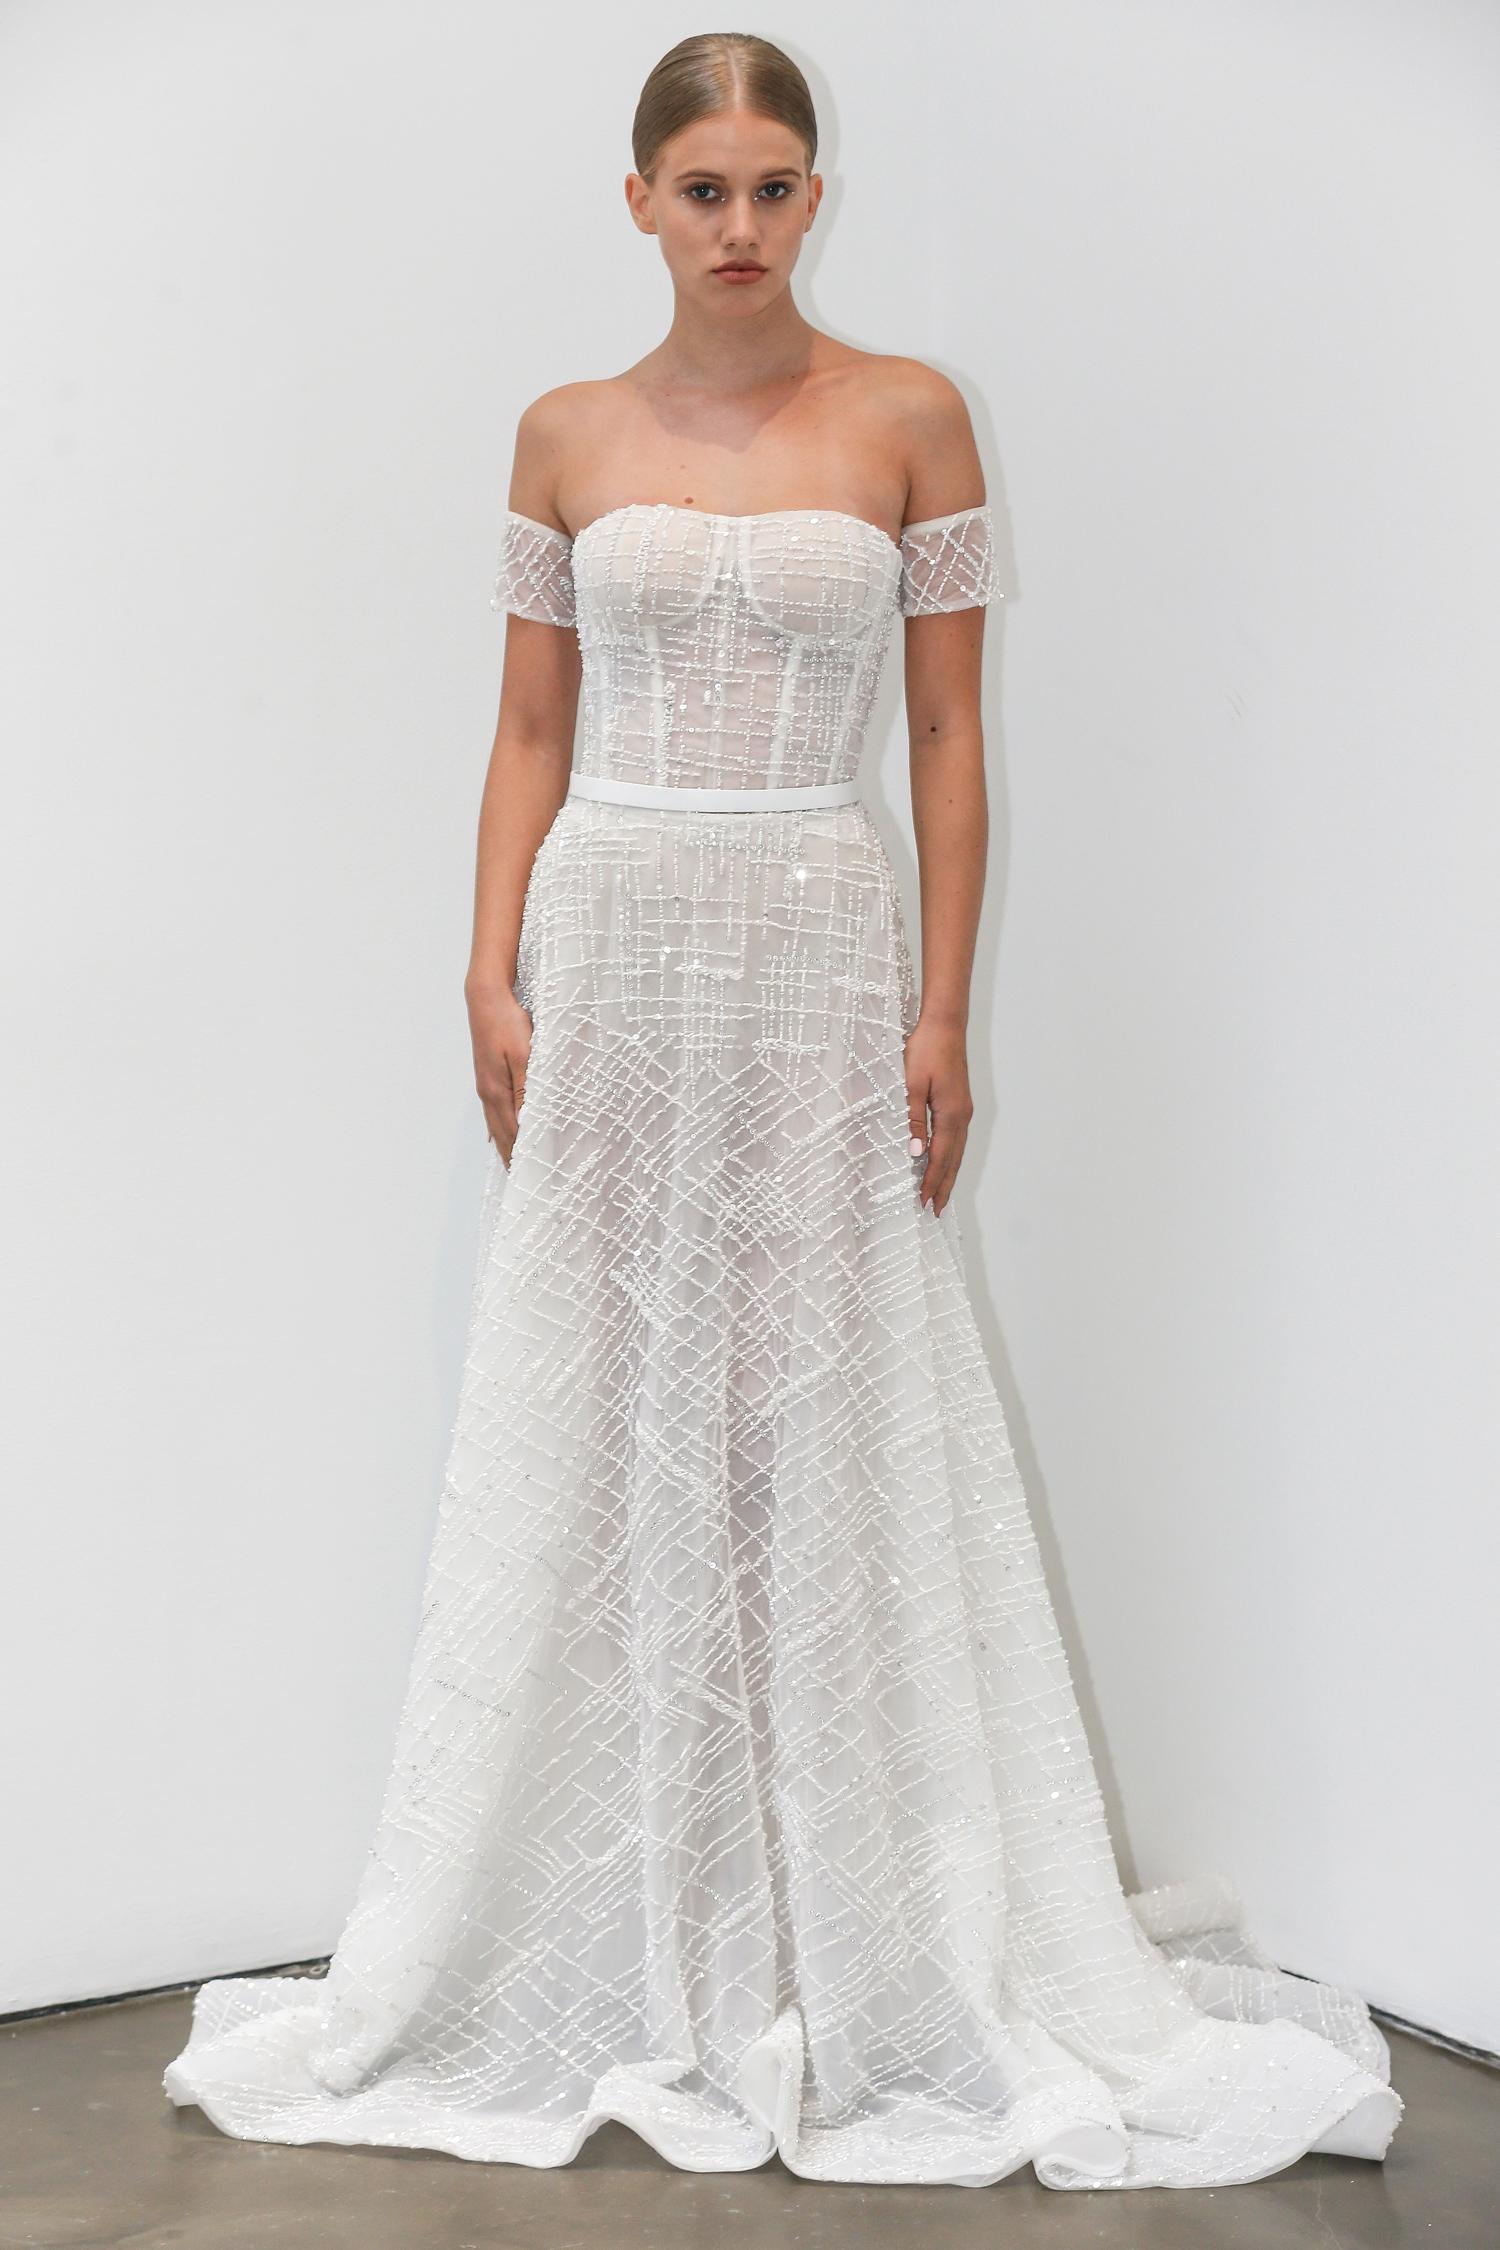 lee petra grebenau fall 2019 glittery off the shoulder a-line gown